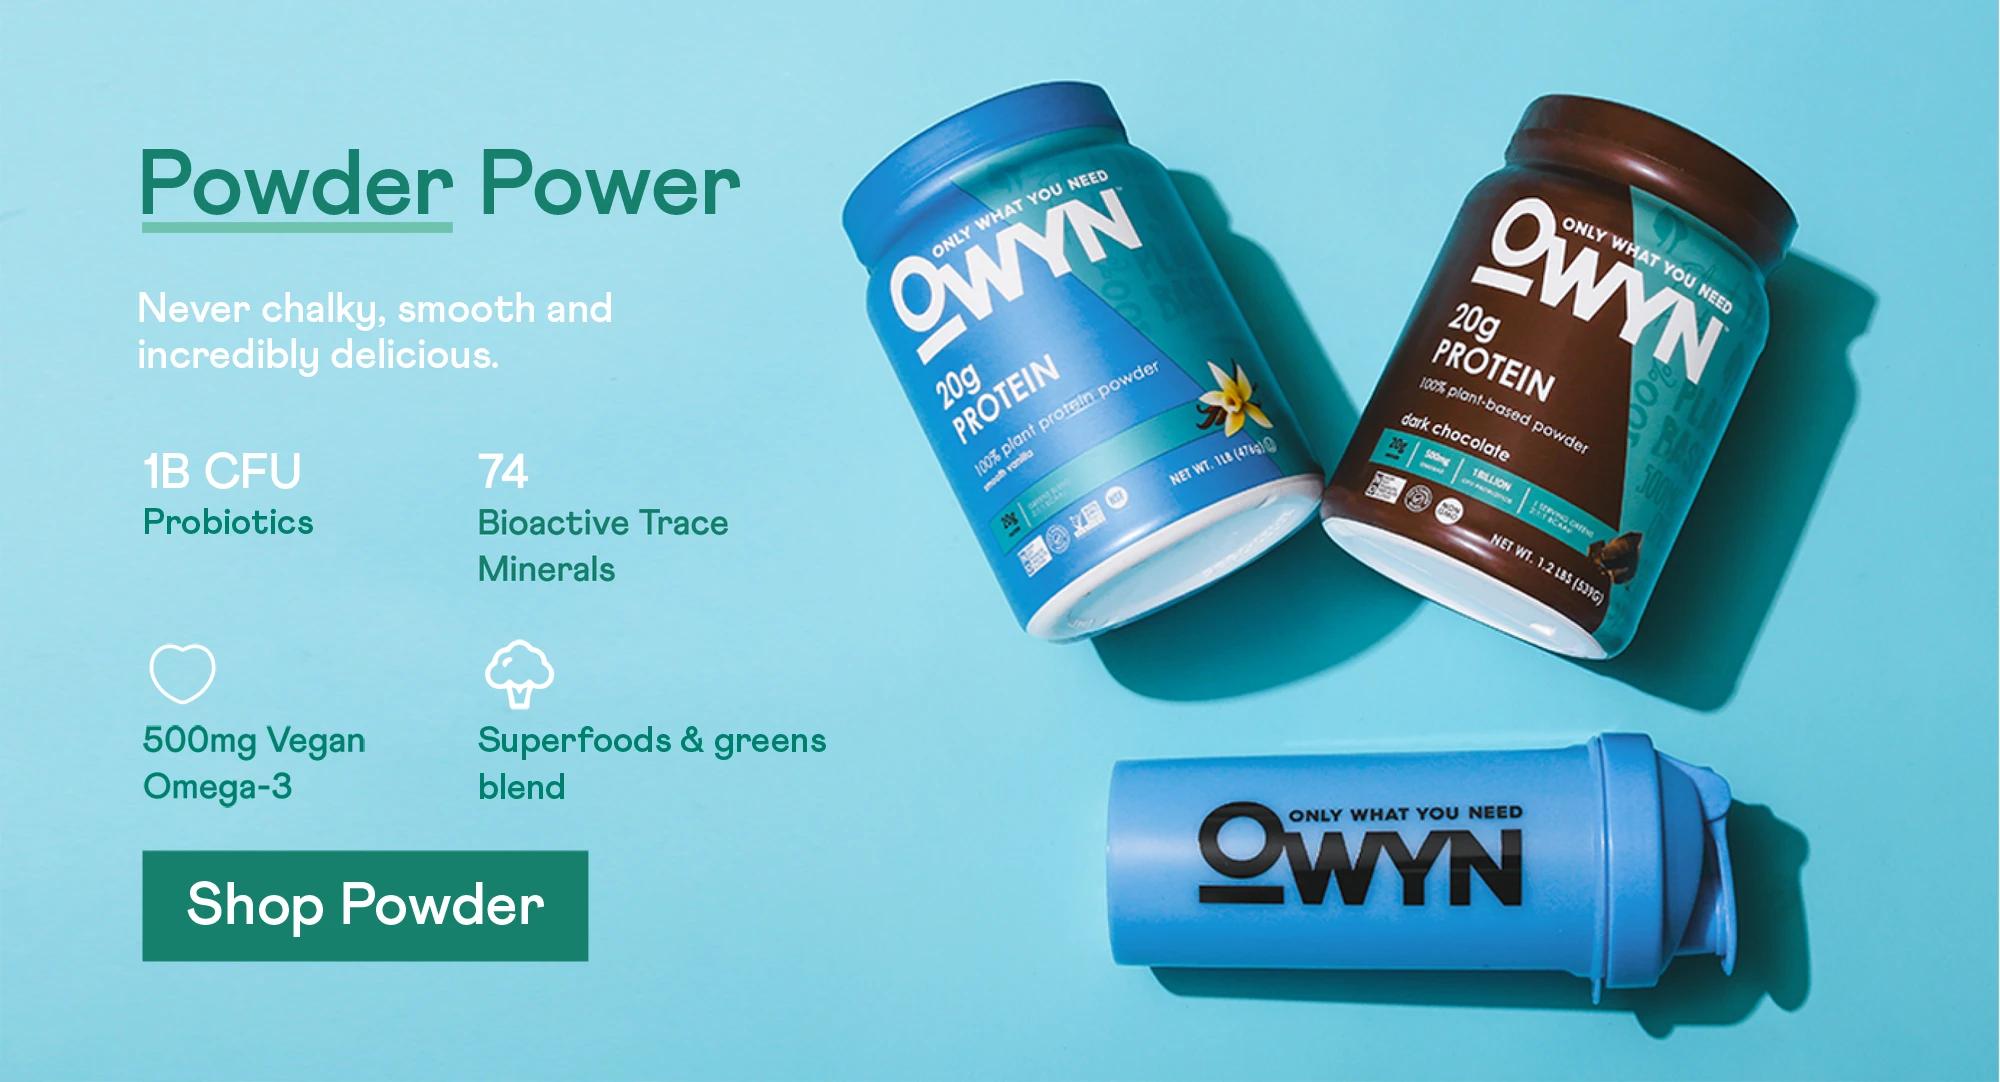 Powder power